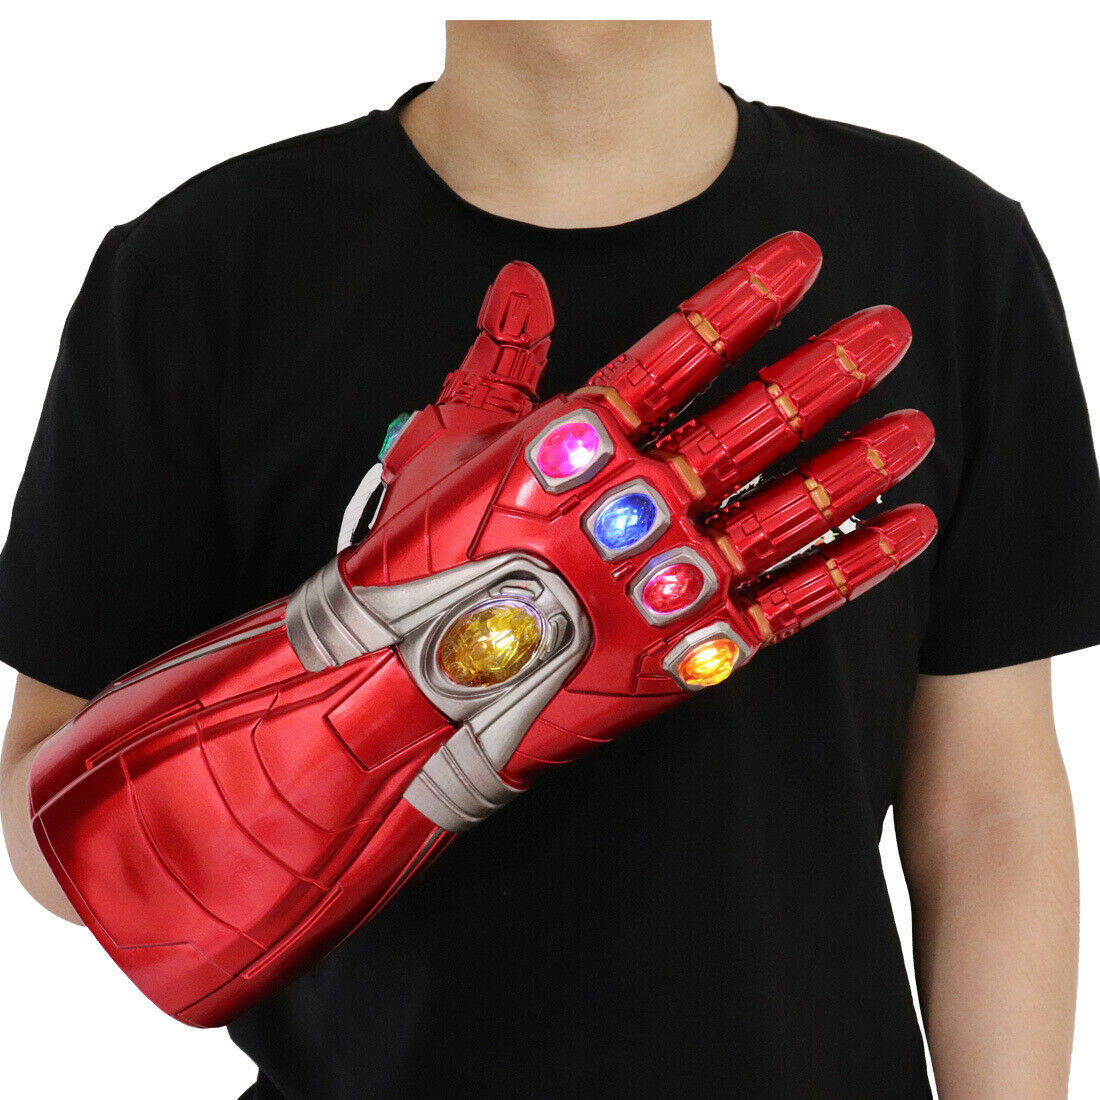 Iron Man Infinity Nano Gauntlet LED Gloves Thanos Avengers 4 Endgame Toys Adults